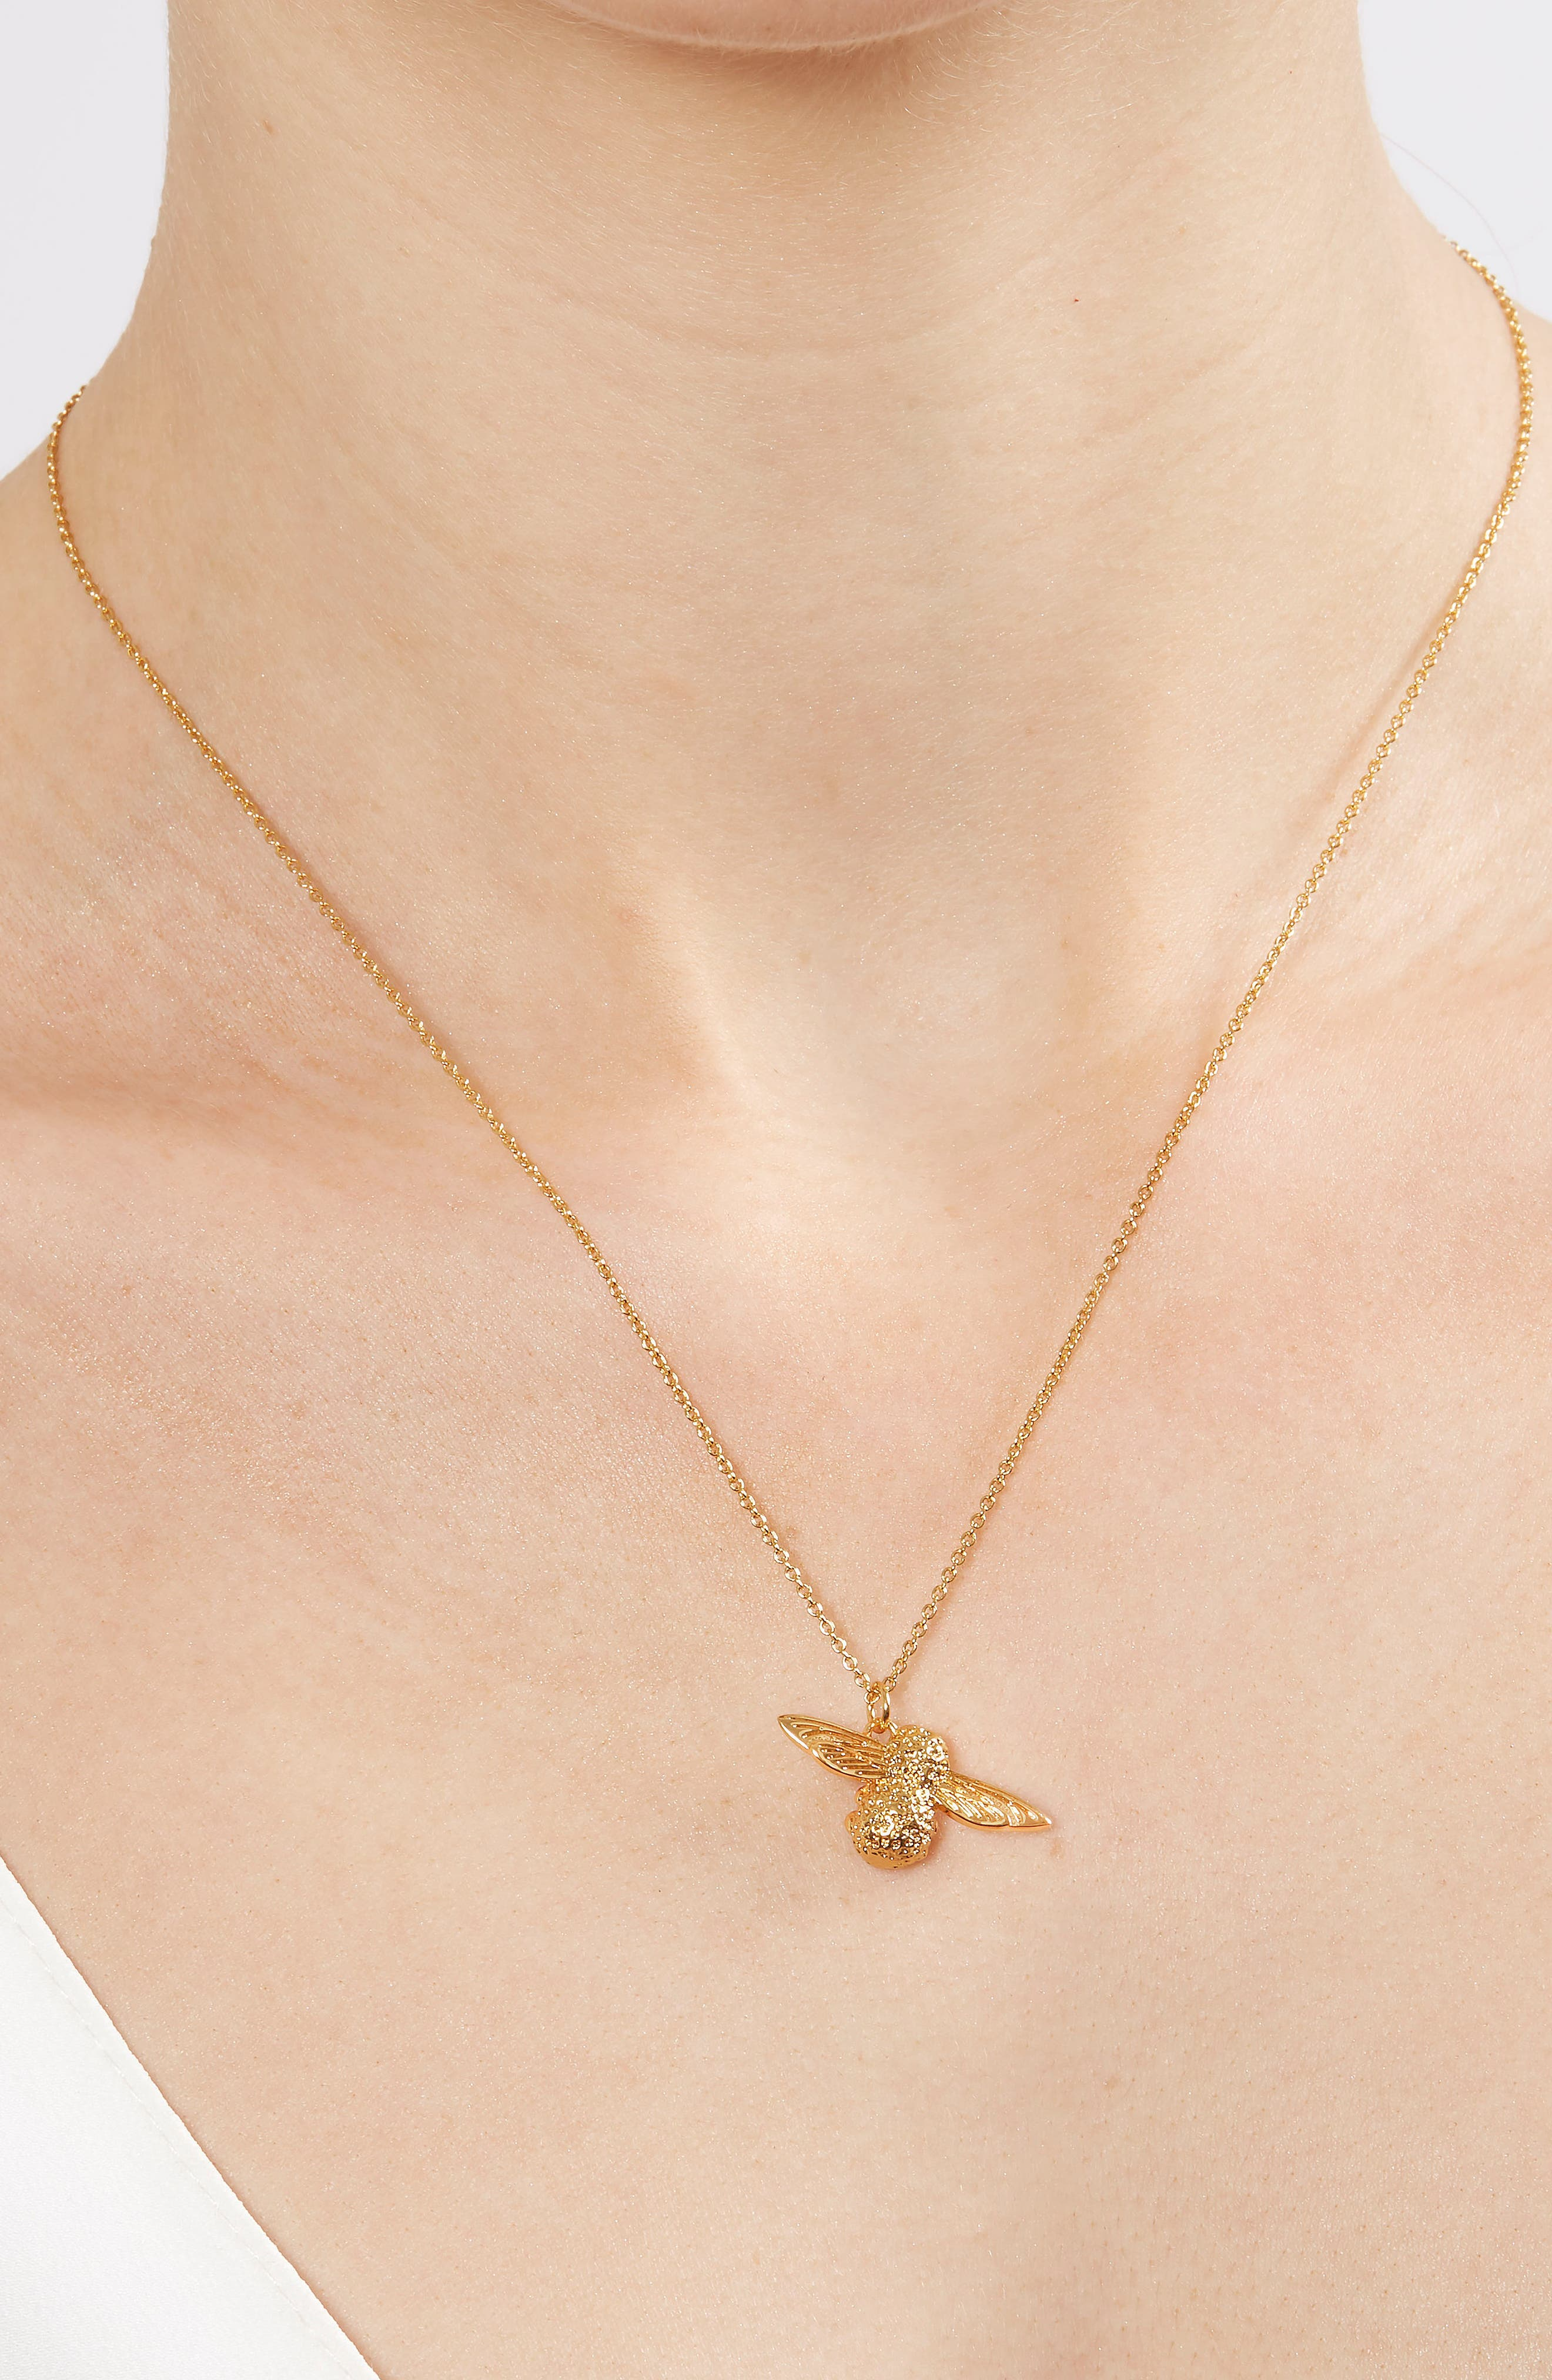 3D Bee Pendant Necklace,                             Alternate thumbnail 3, color,                             Gold